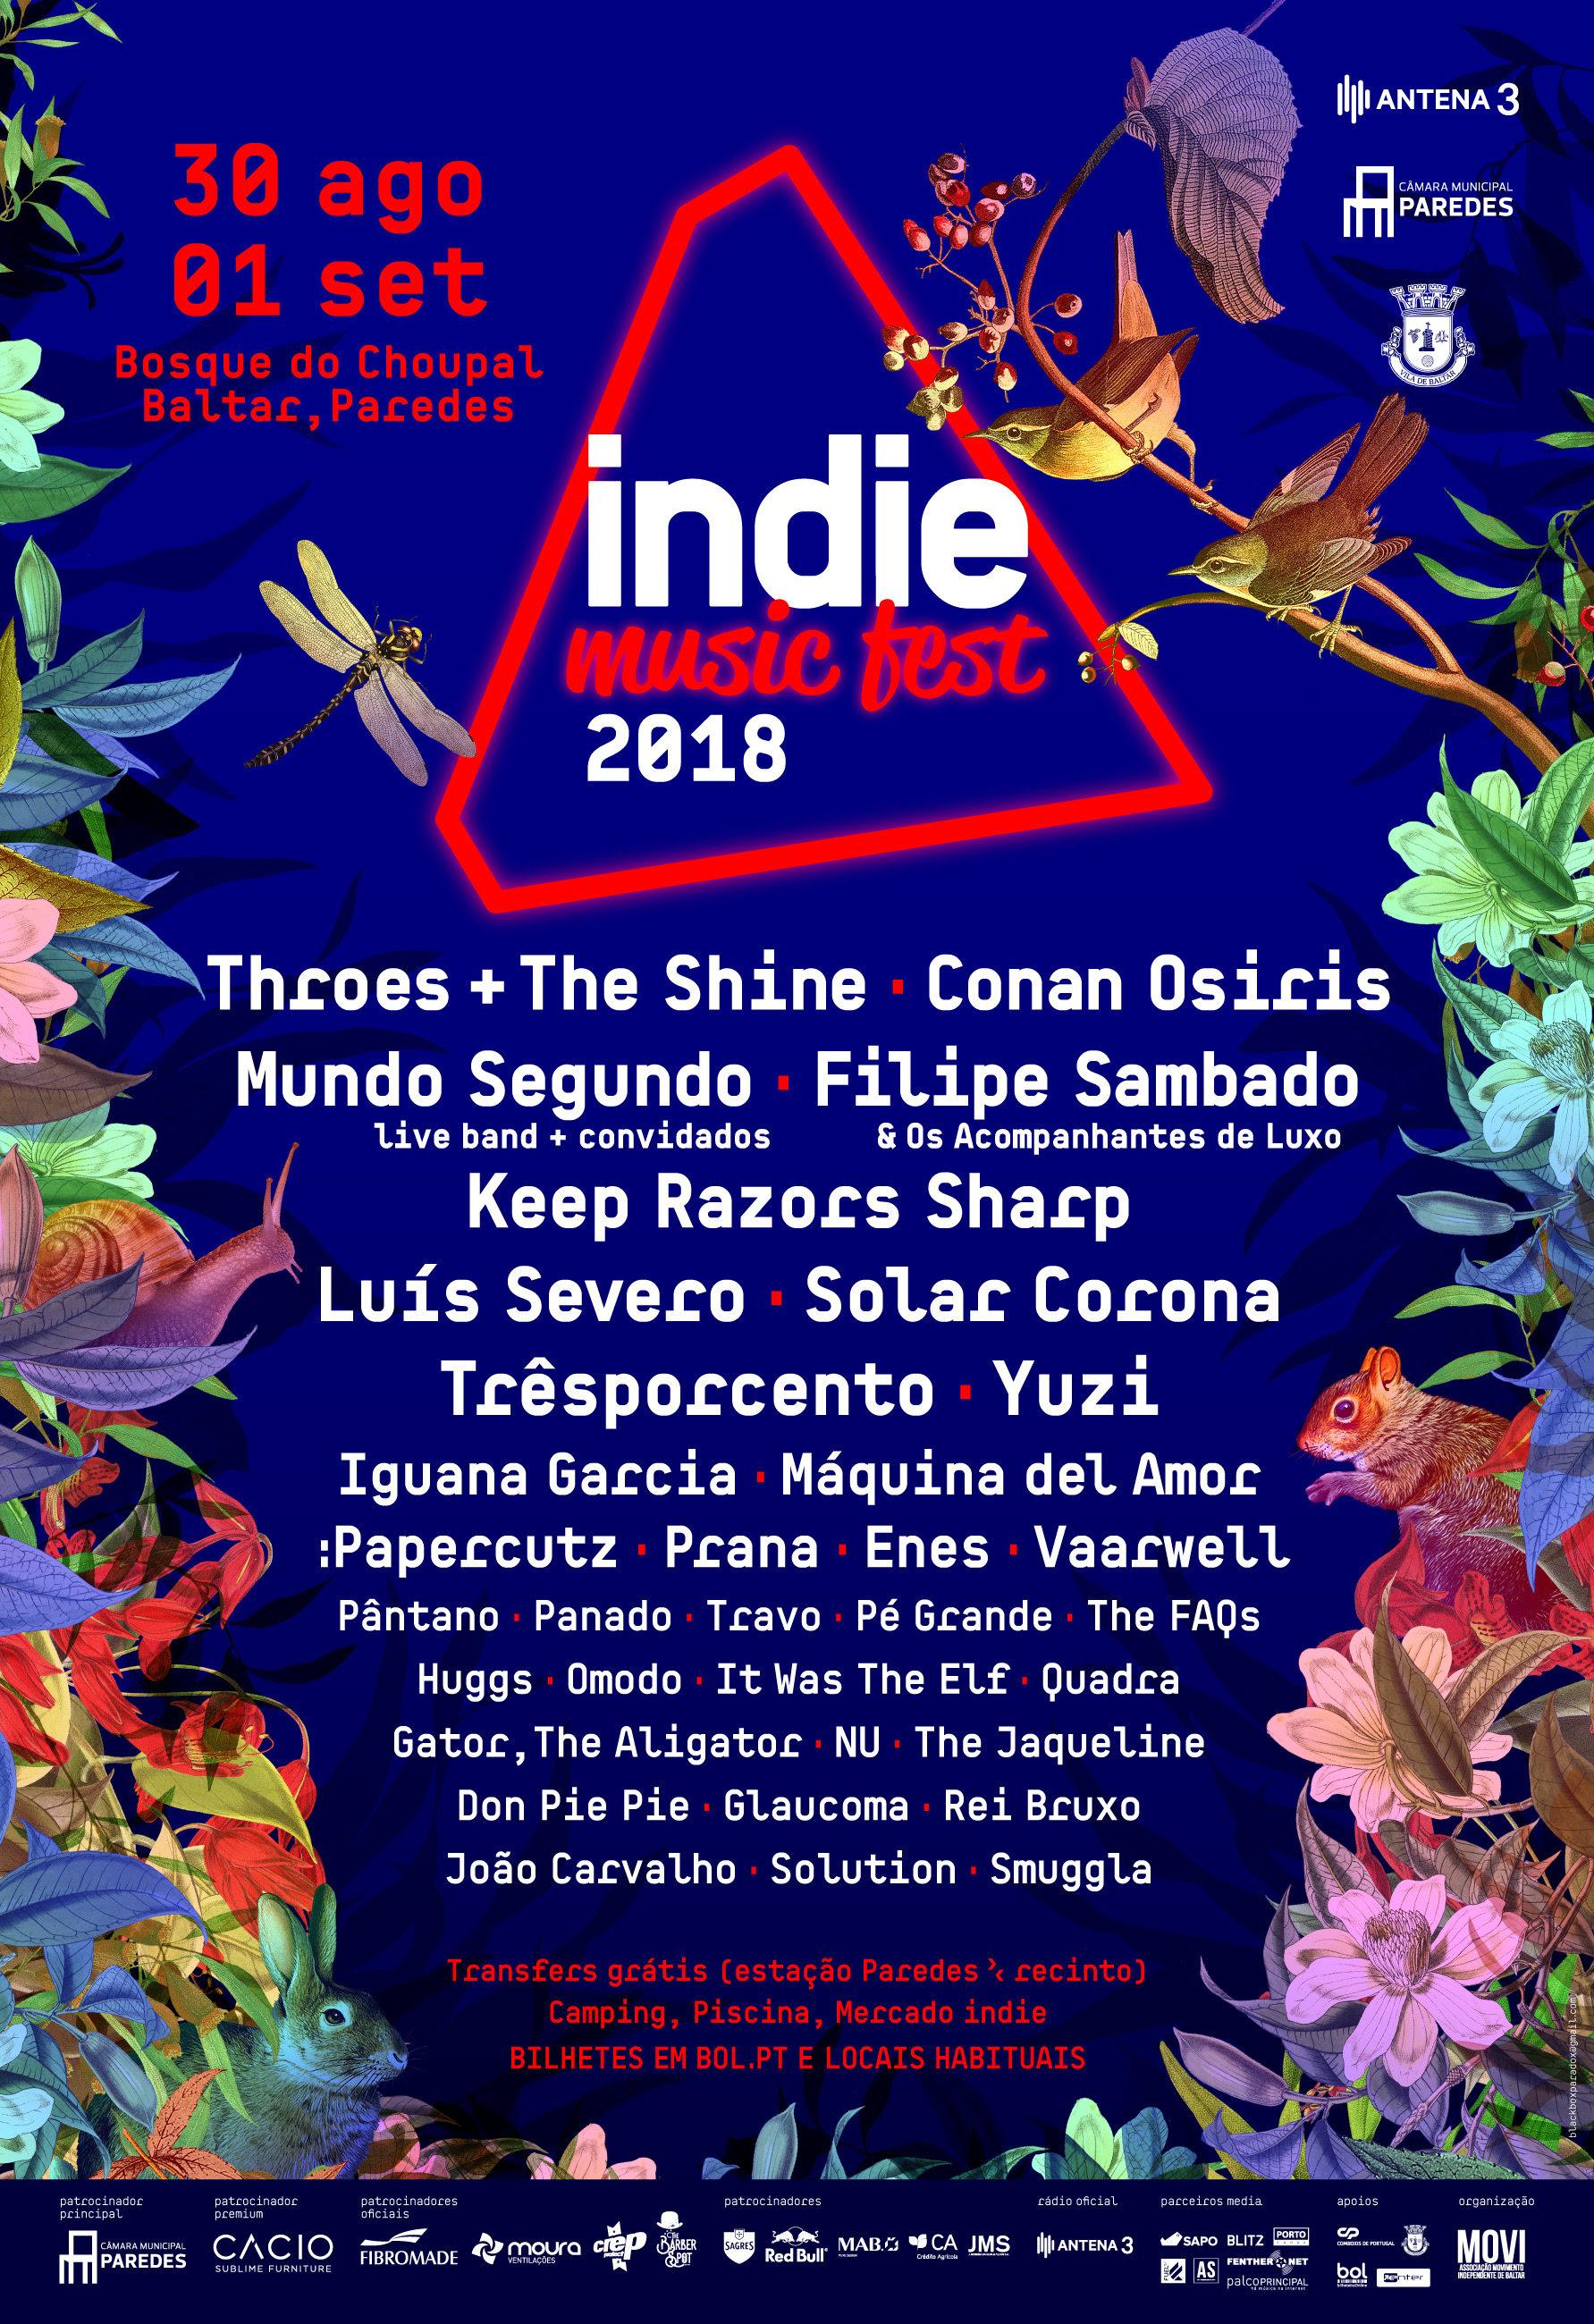 Cartaz Indie Music Fest 2018 - bandas - alinhamento